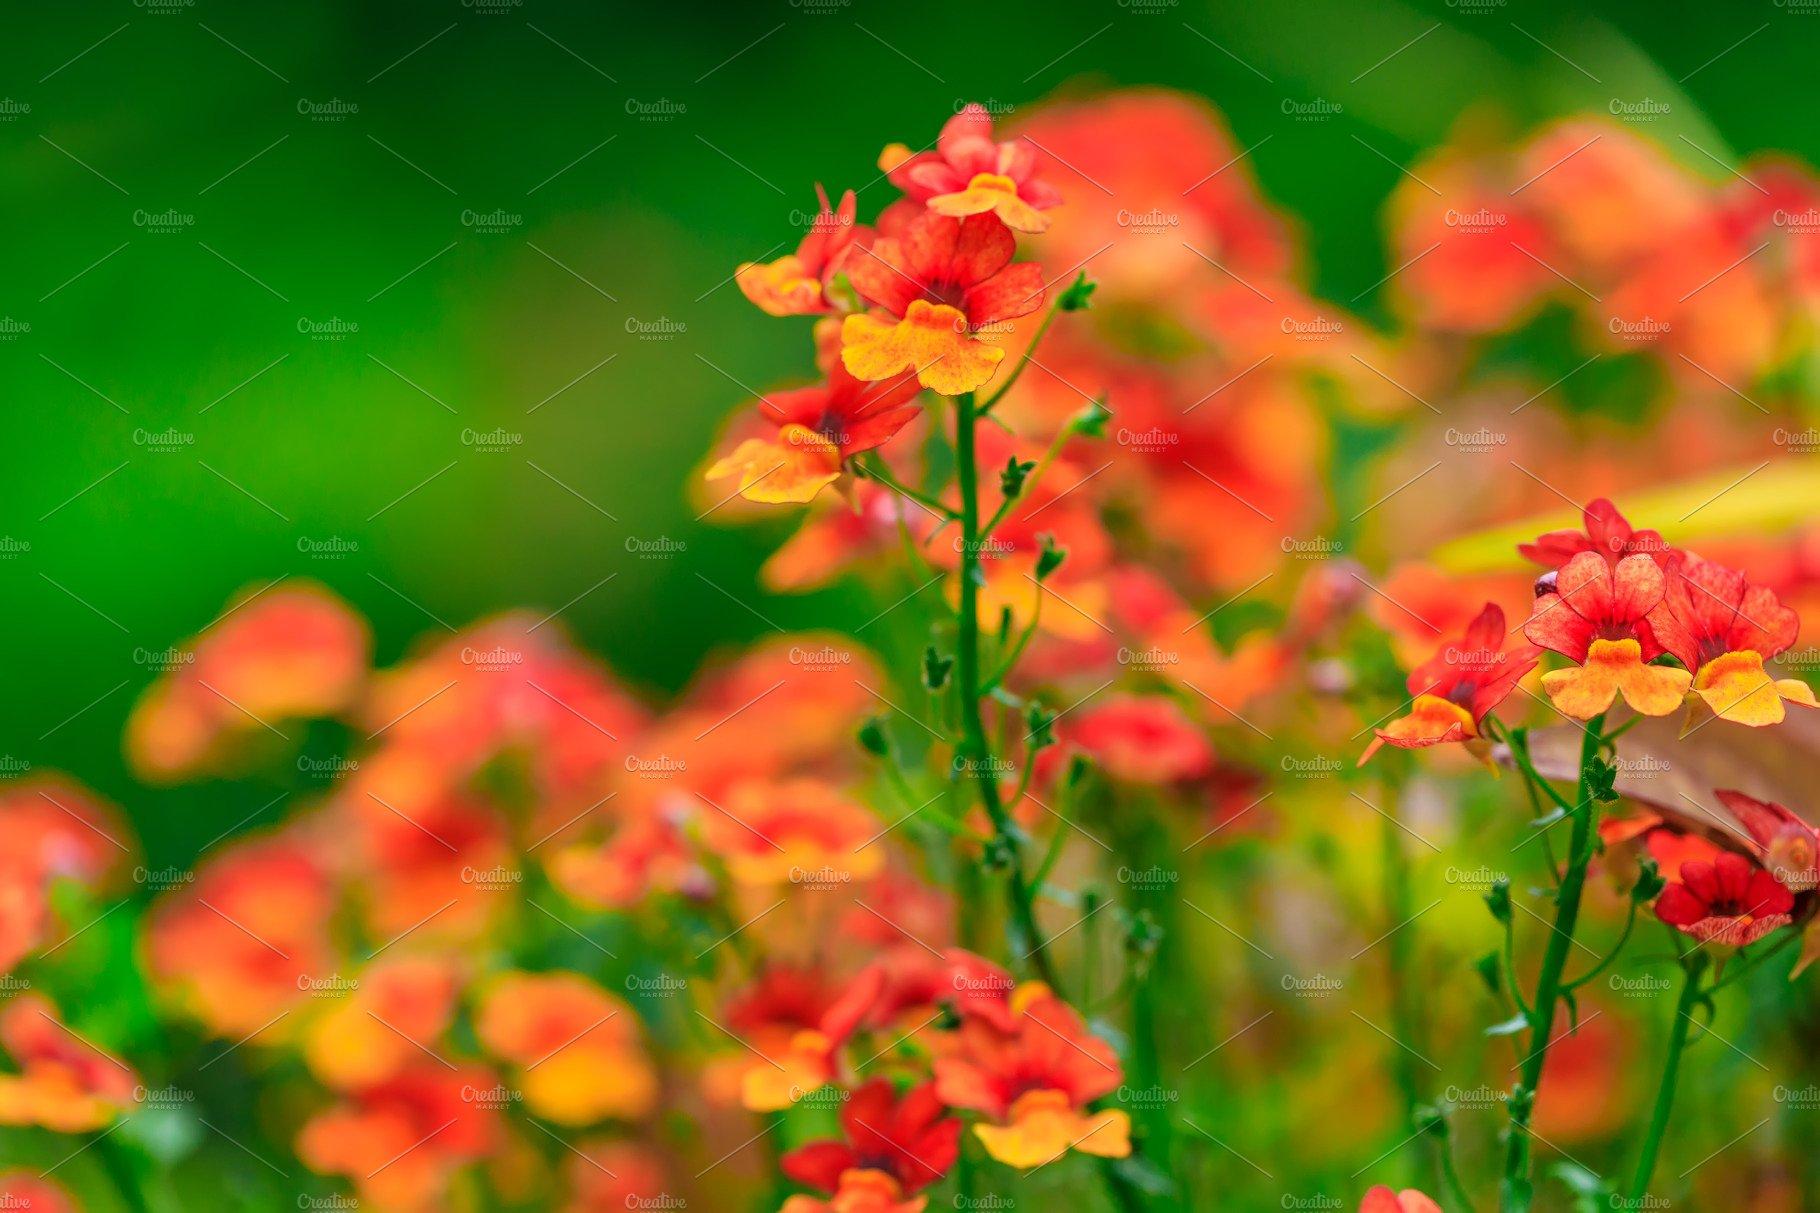 Nasturtium Edible Flower High Quality Nature Stock Photos Creative Market,Lemon Drop Shots Recipe